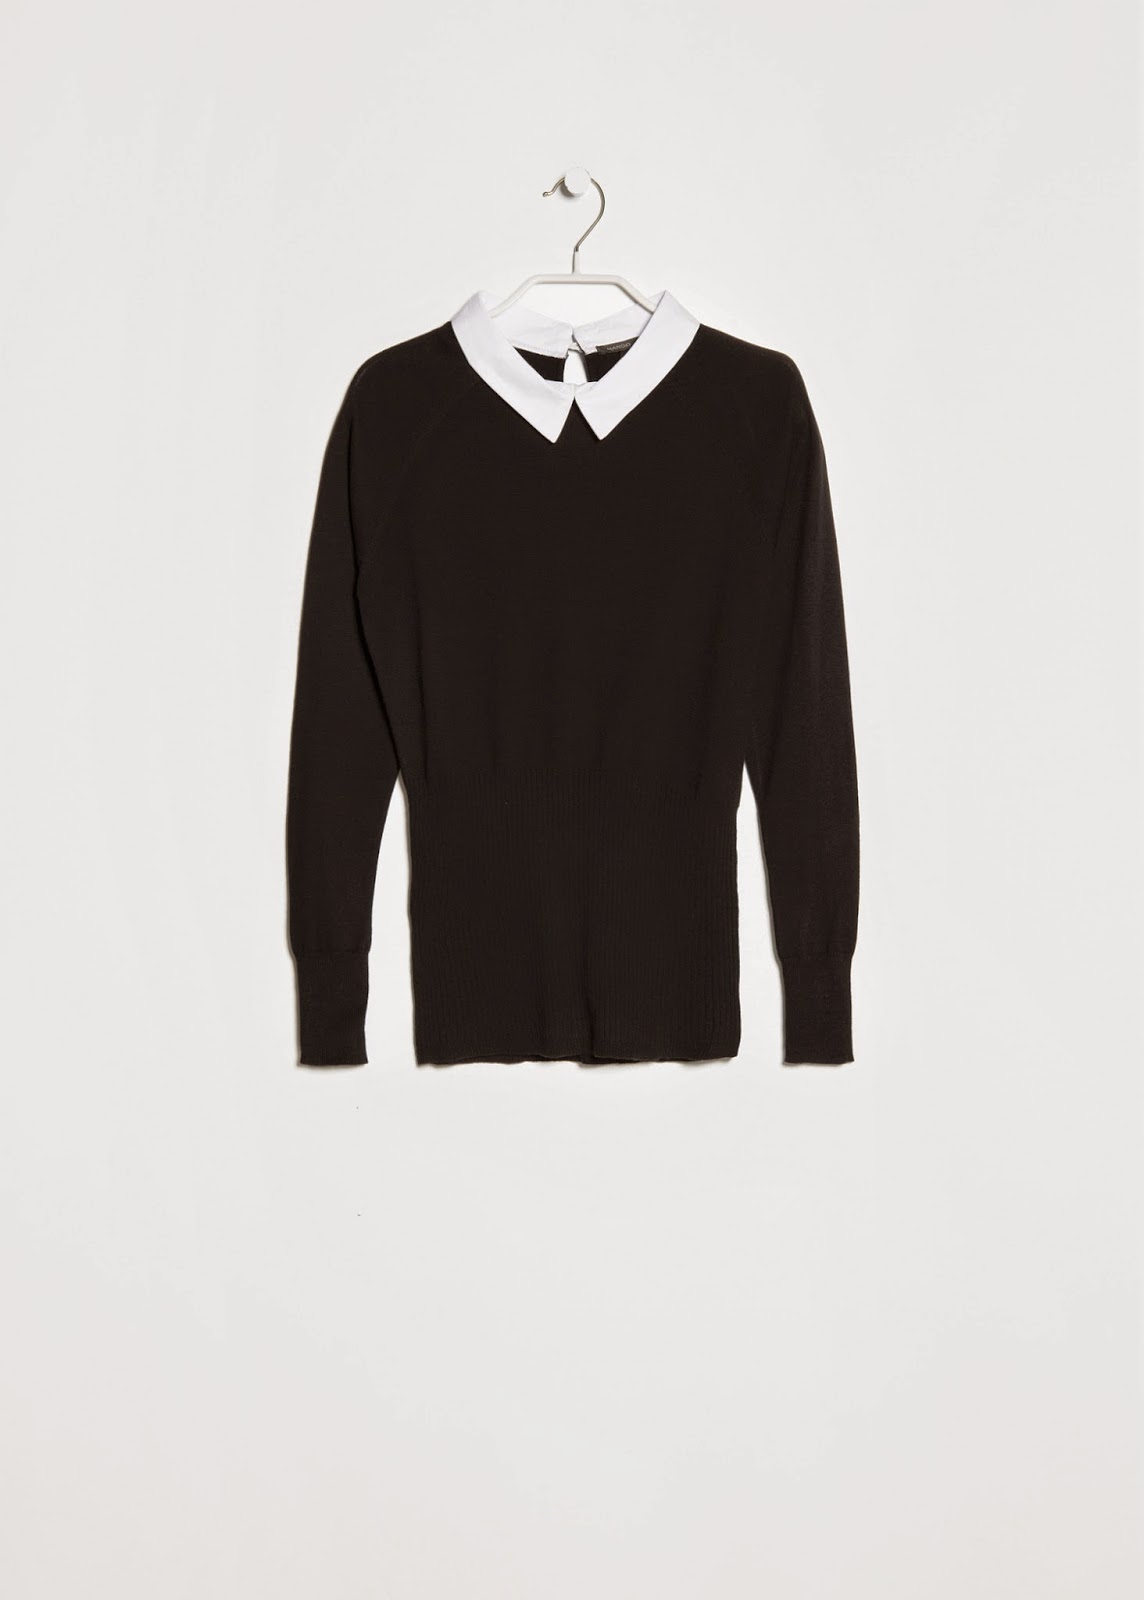 white collar jumper